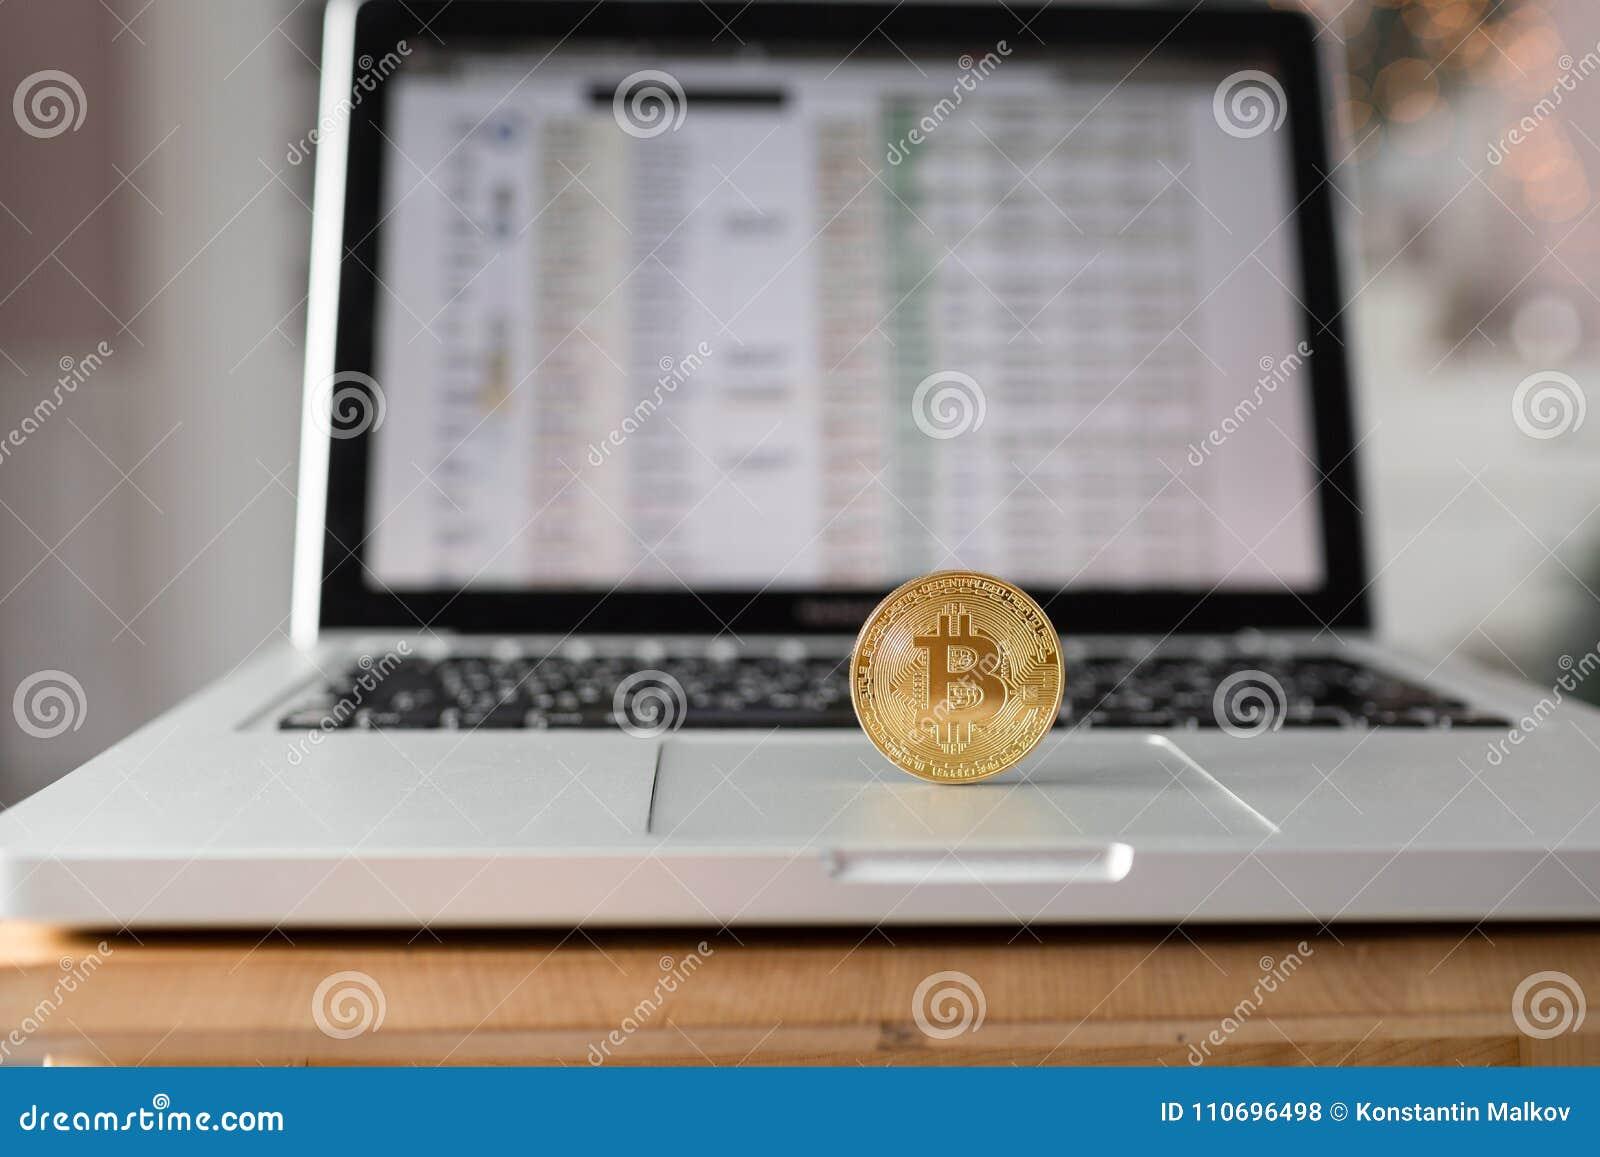 trading rapid bitcoin comerț btc sau usdt